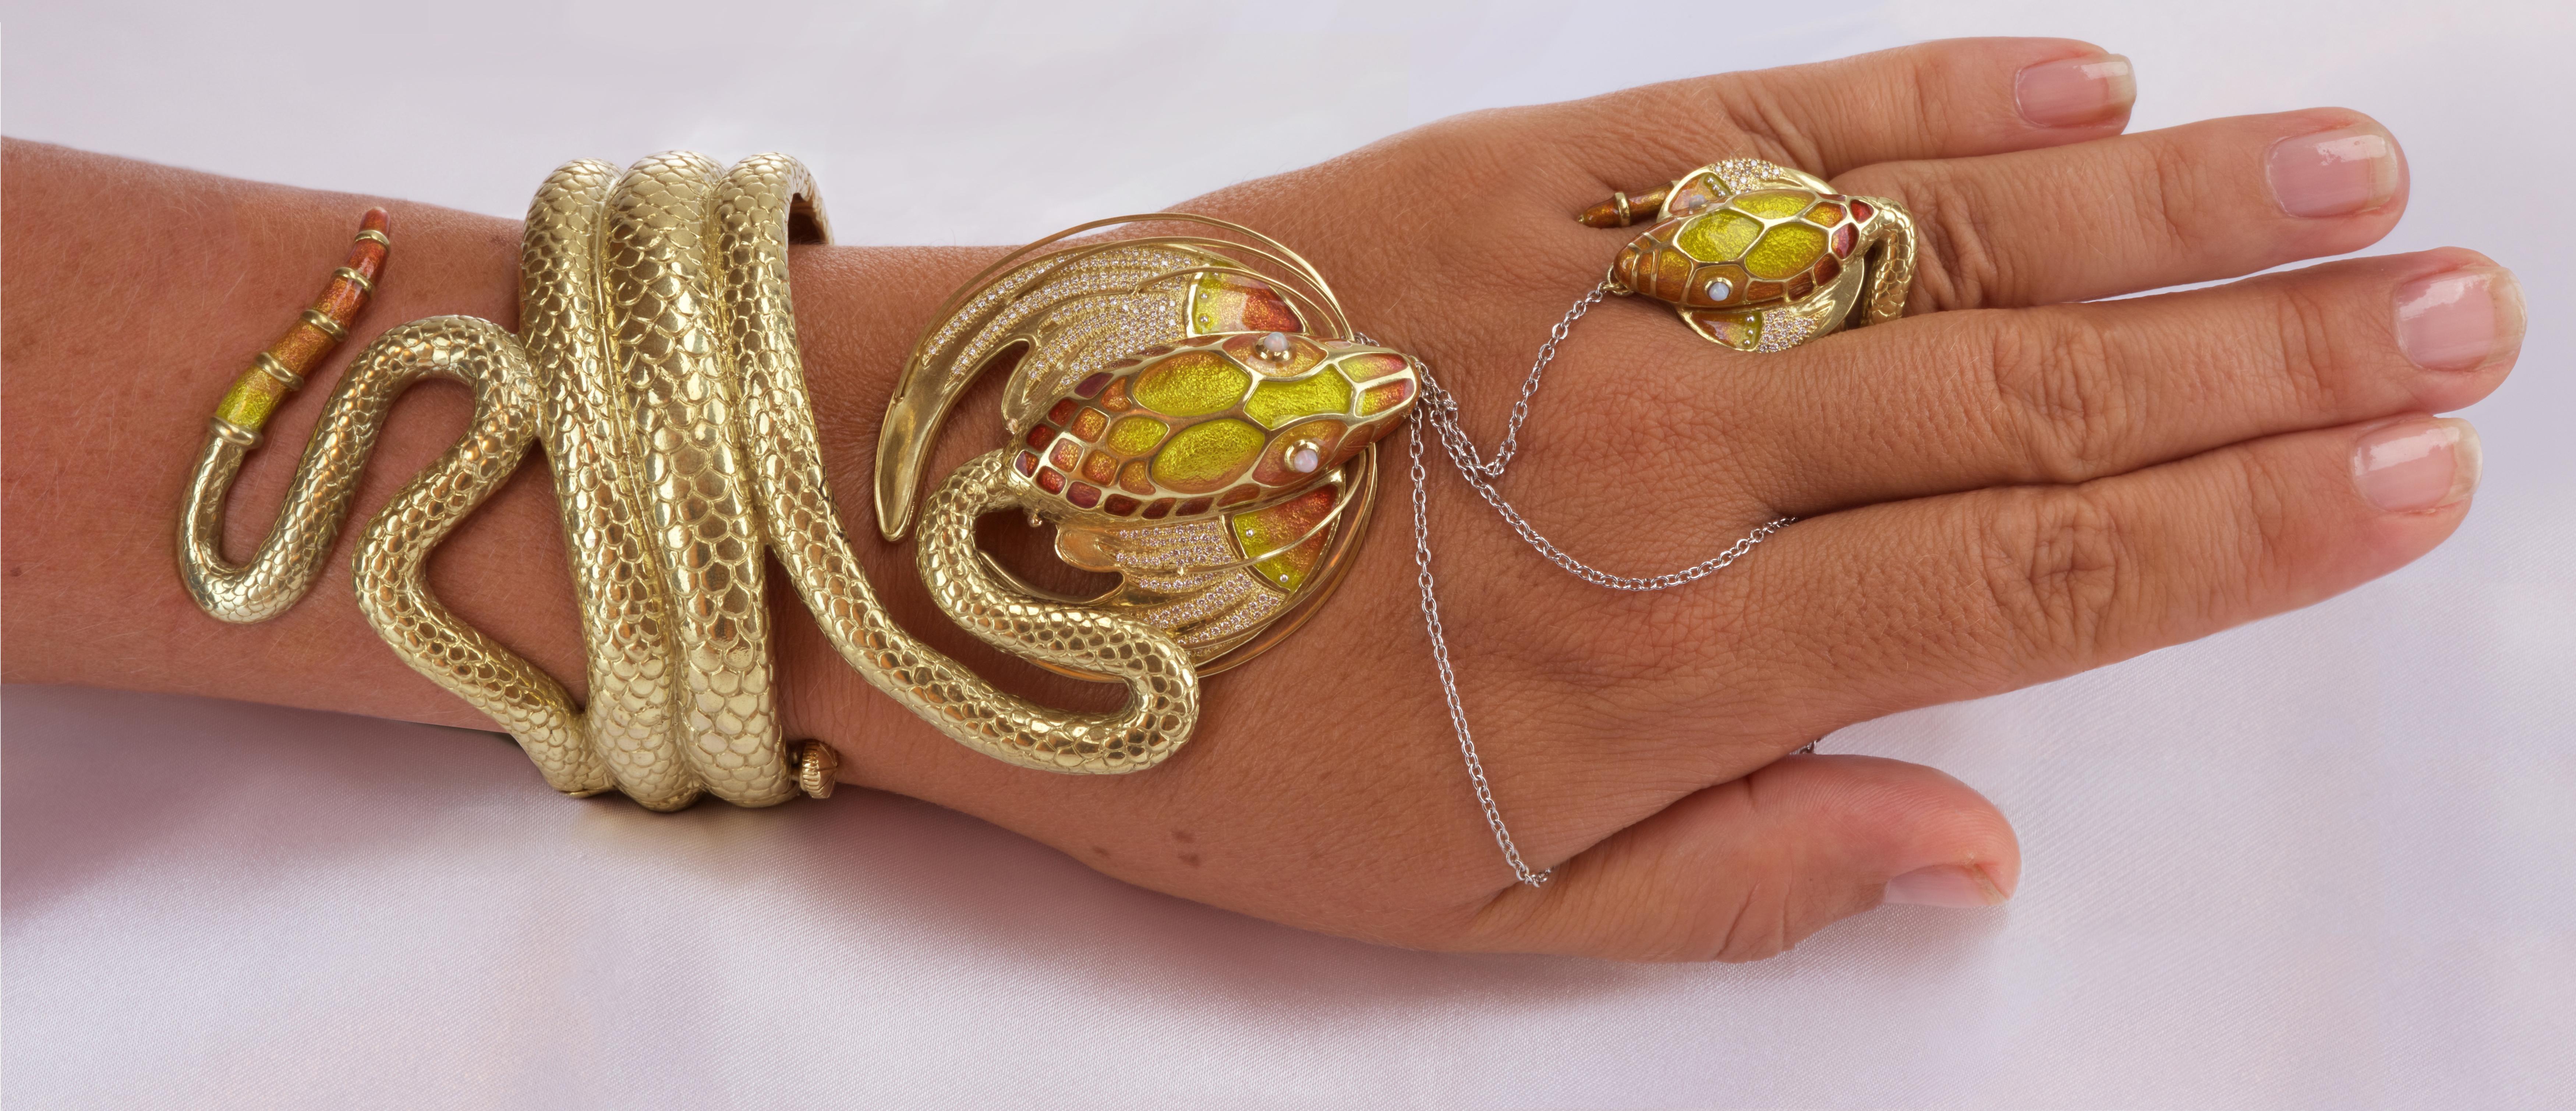 Designed after the Serpent of Sarah Bernhardt